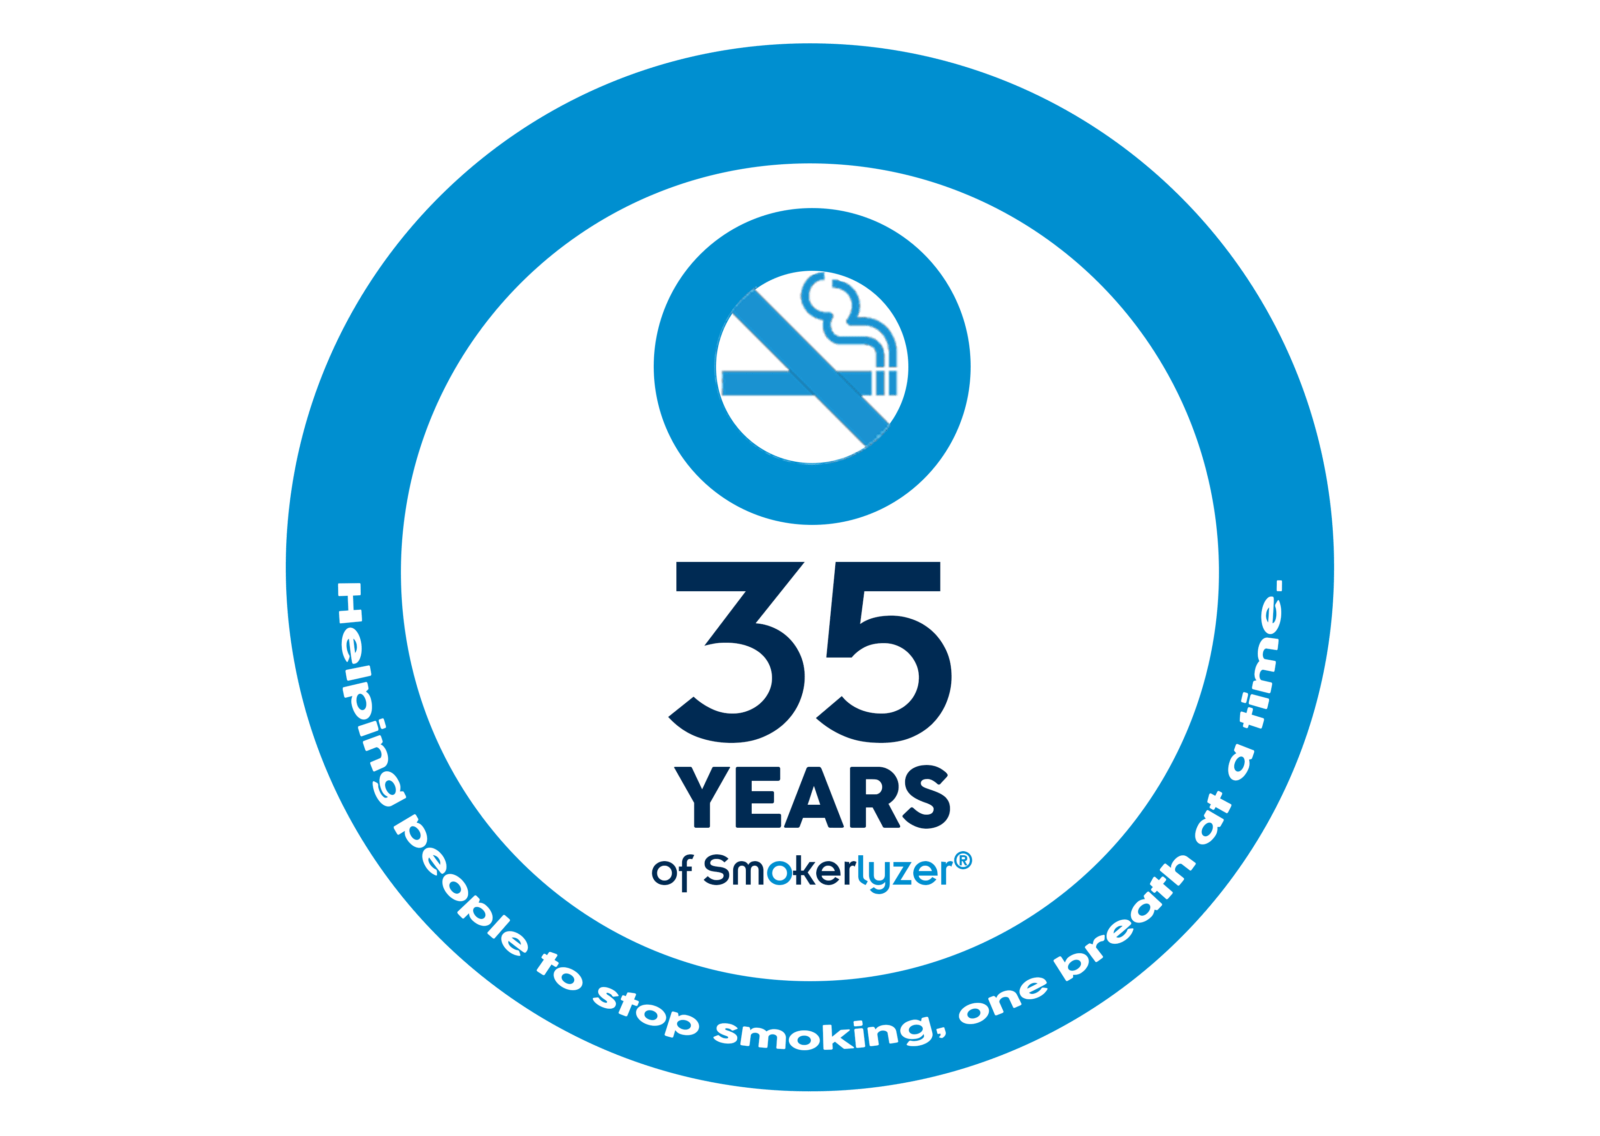 30 years of smokerlyzer logo ready for printing 1